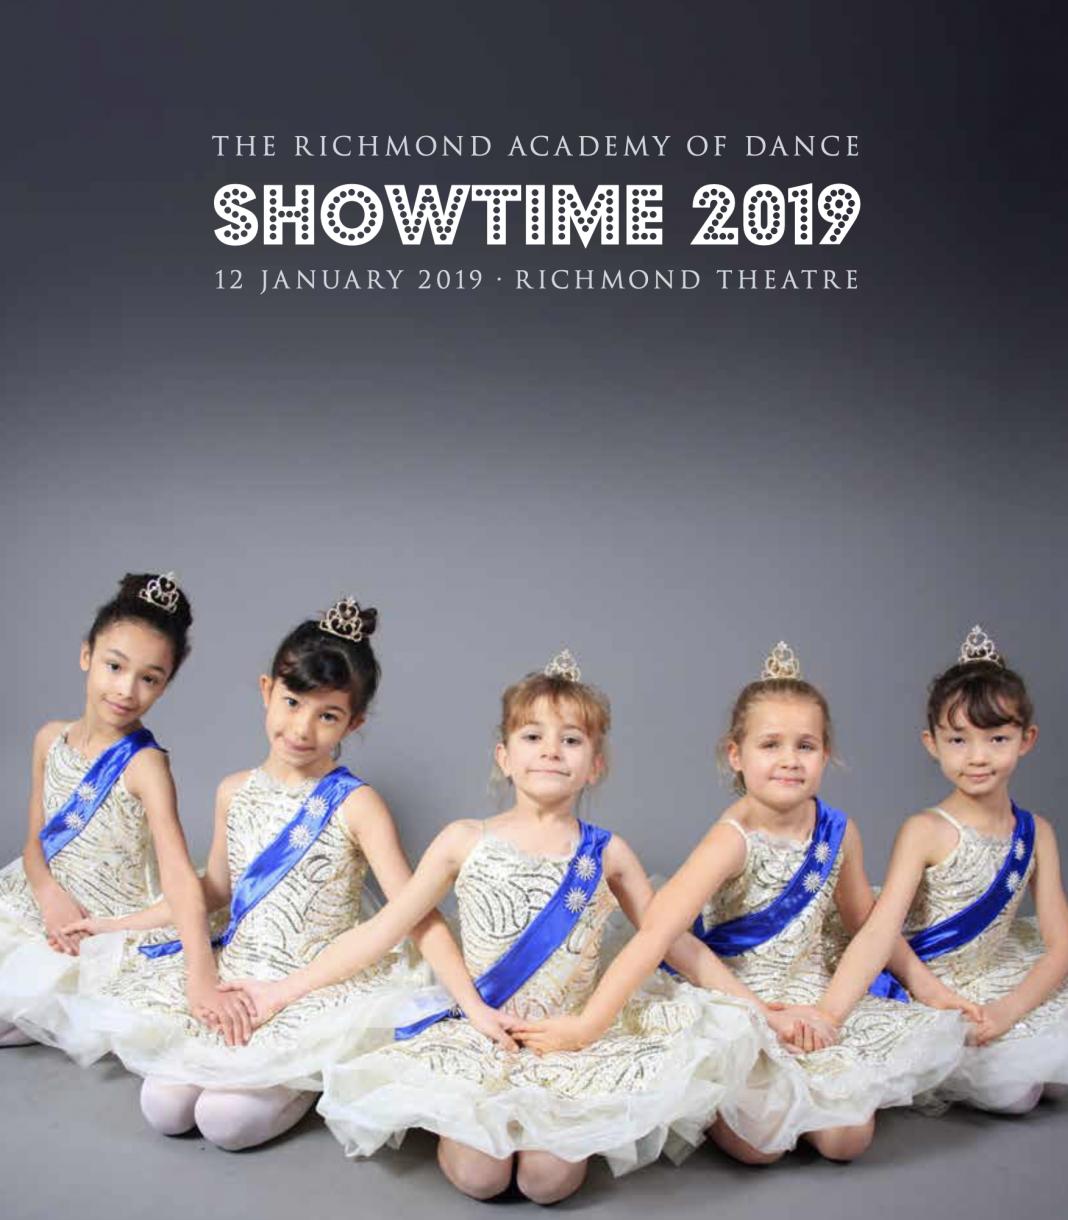 Showtime 2019 dance academy programme